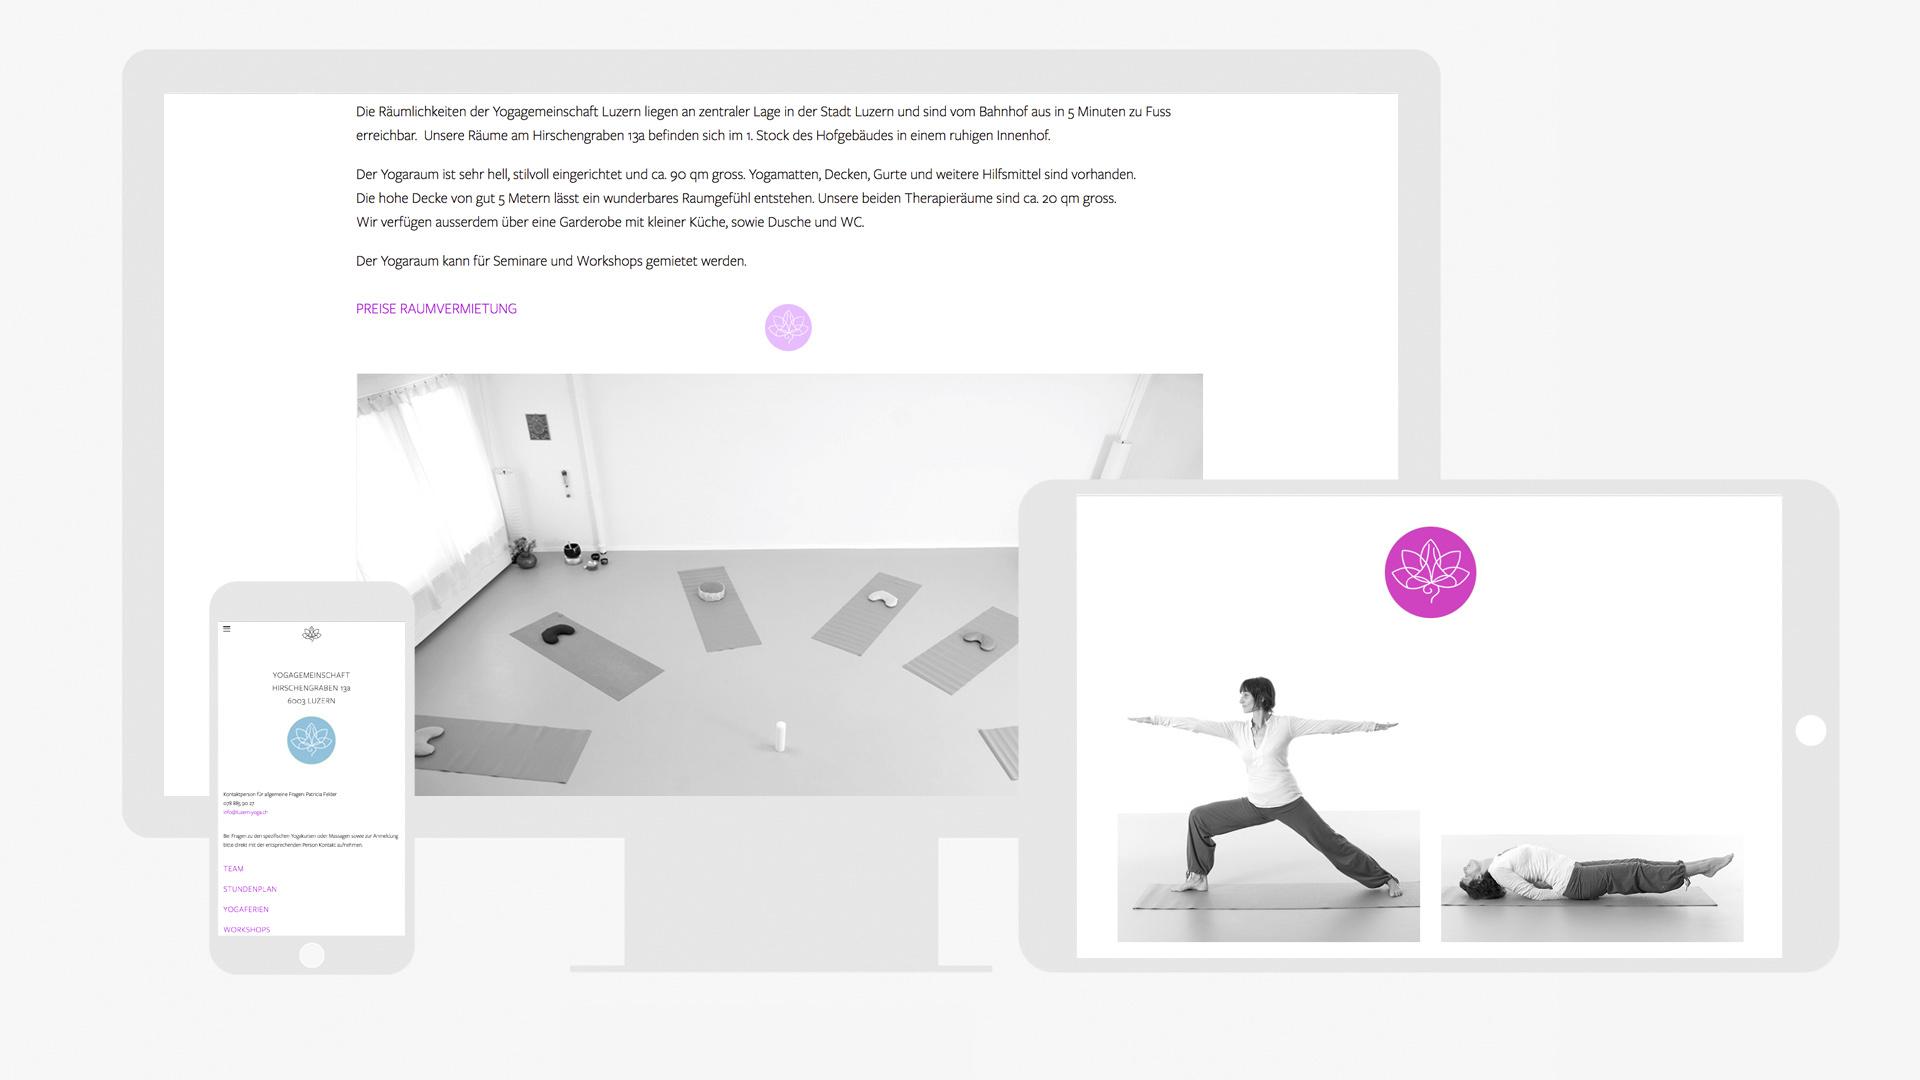 lauperzemp_overview_yoga_text.jpg